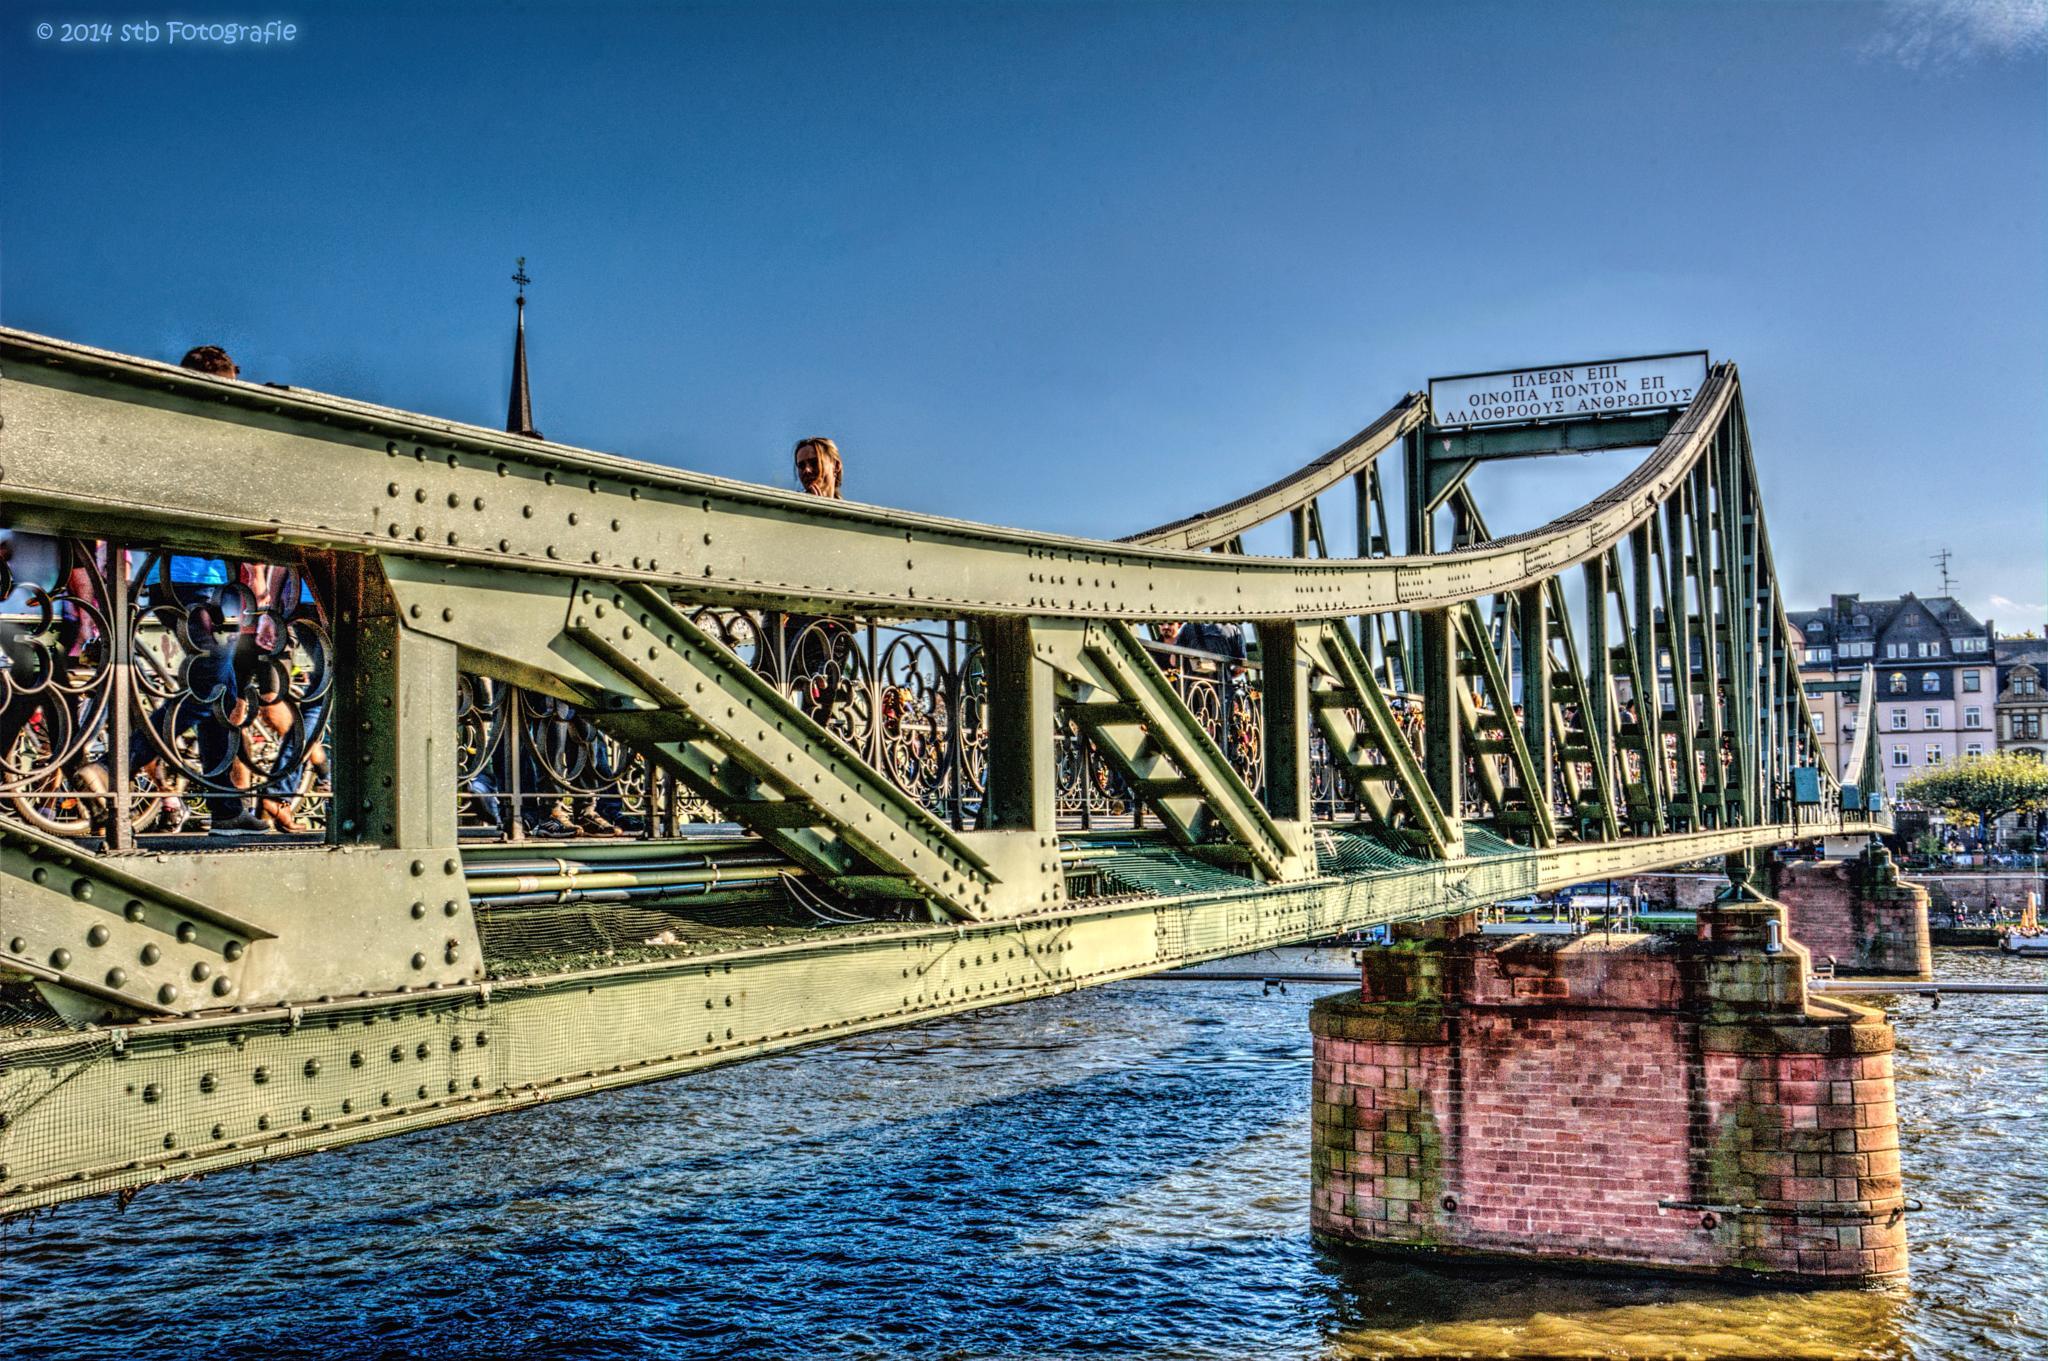 Frankfurt -iron Bridge- by Steffen Batzler